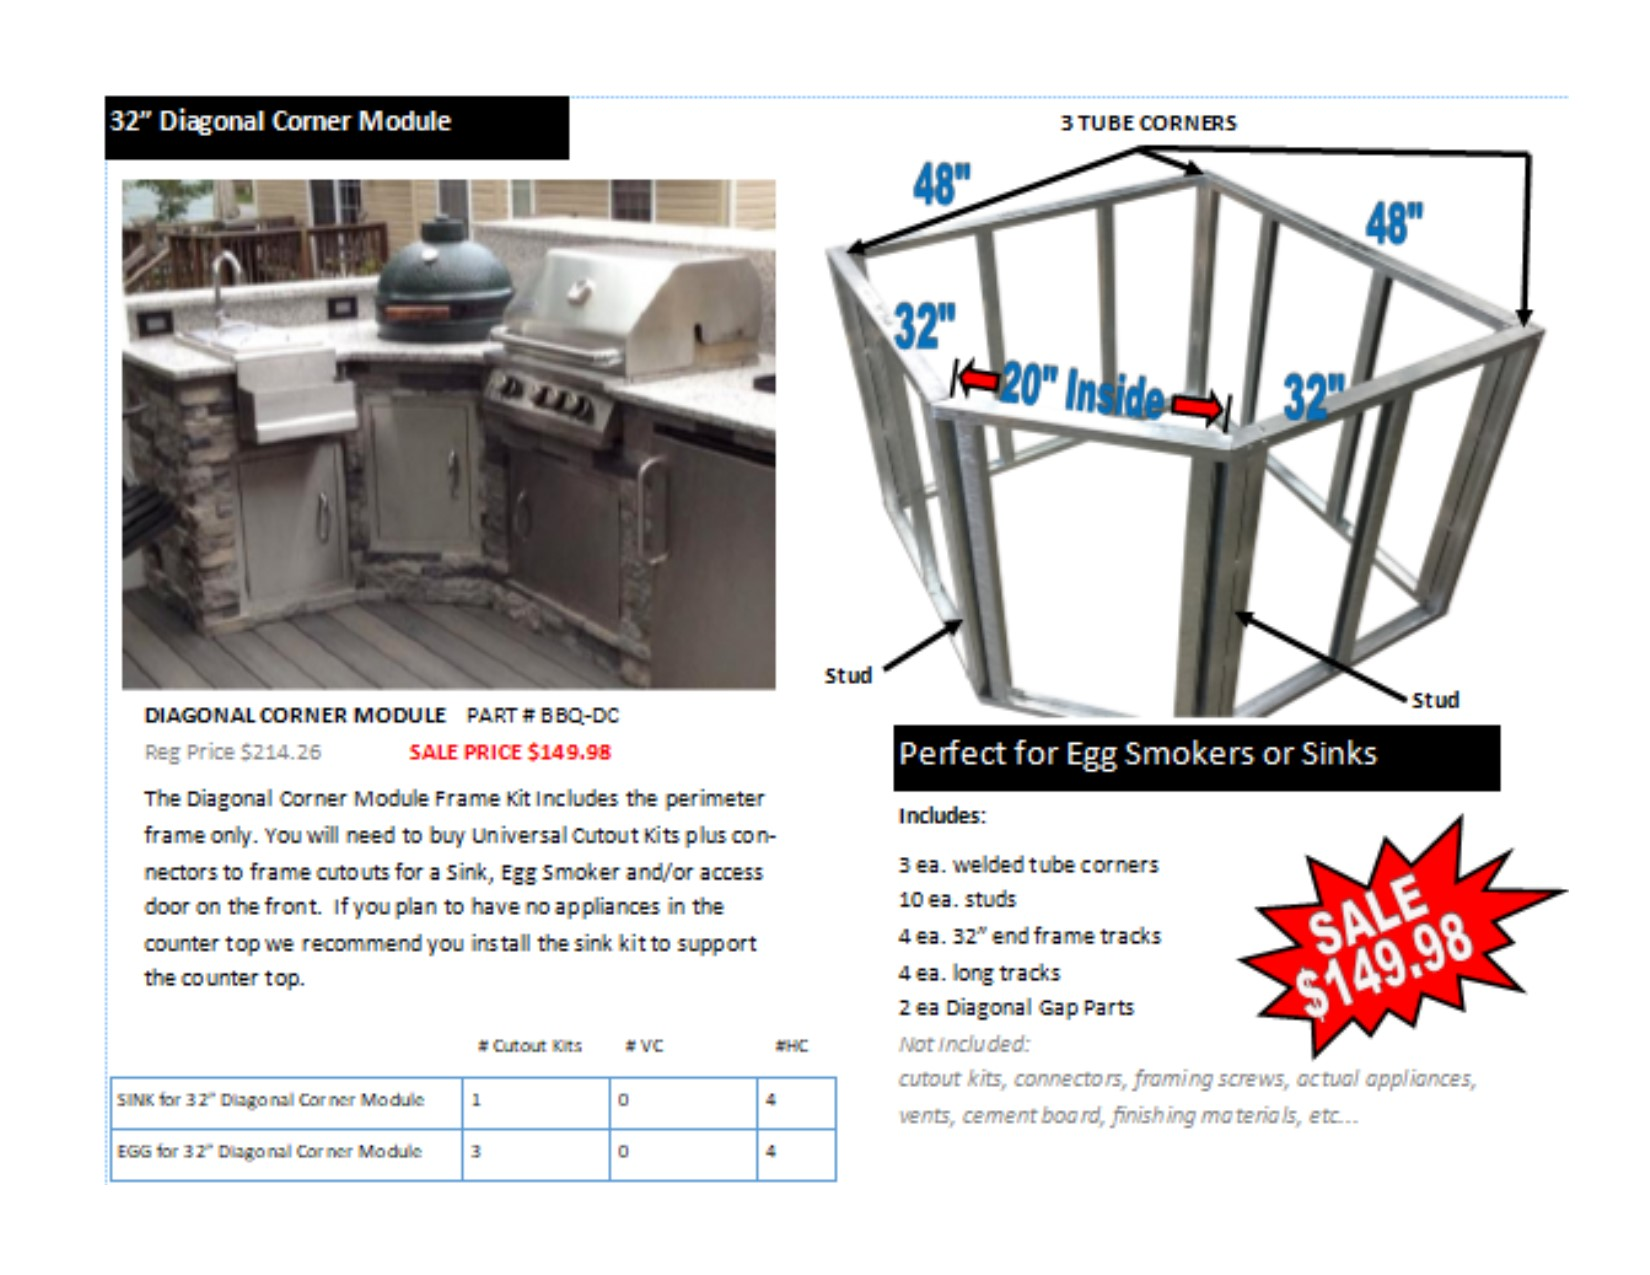 diag-corner-mod-catalog-page.jpg